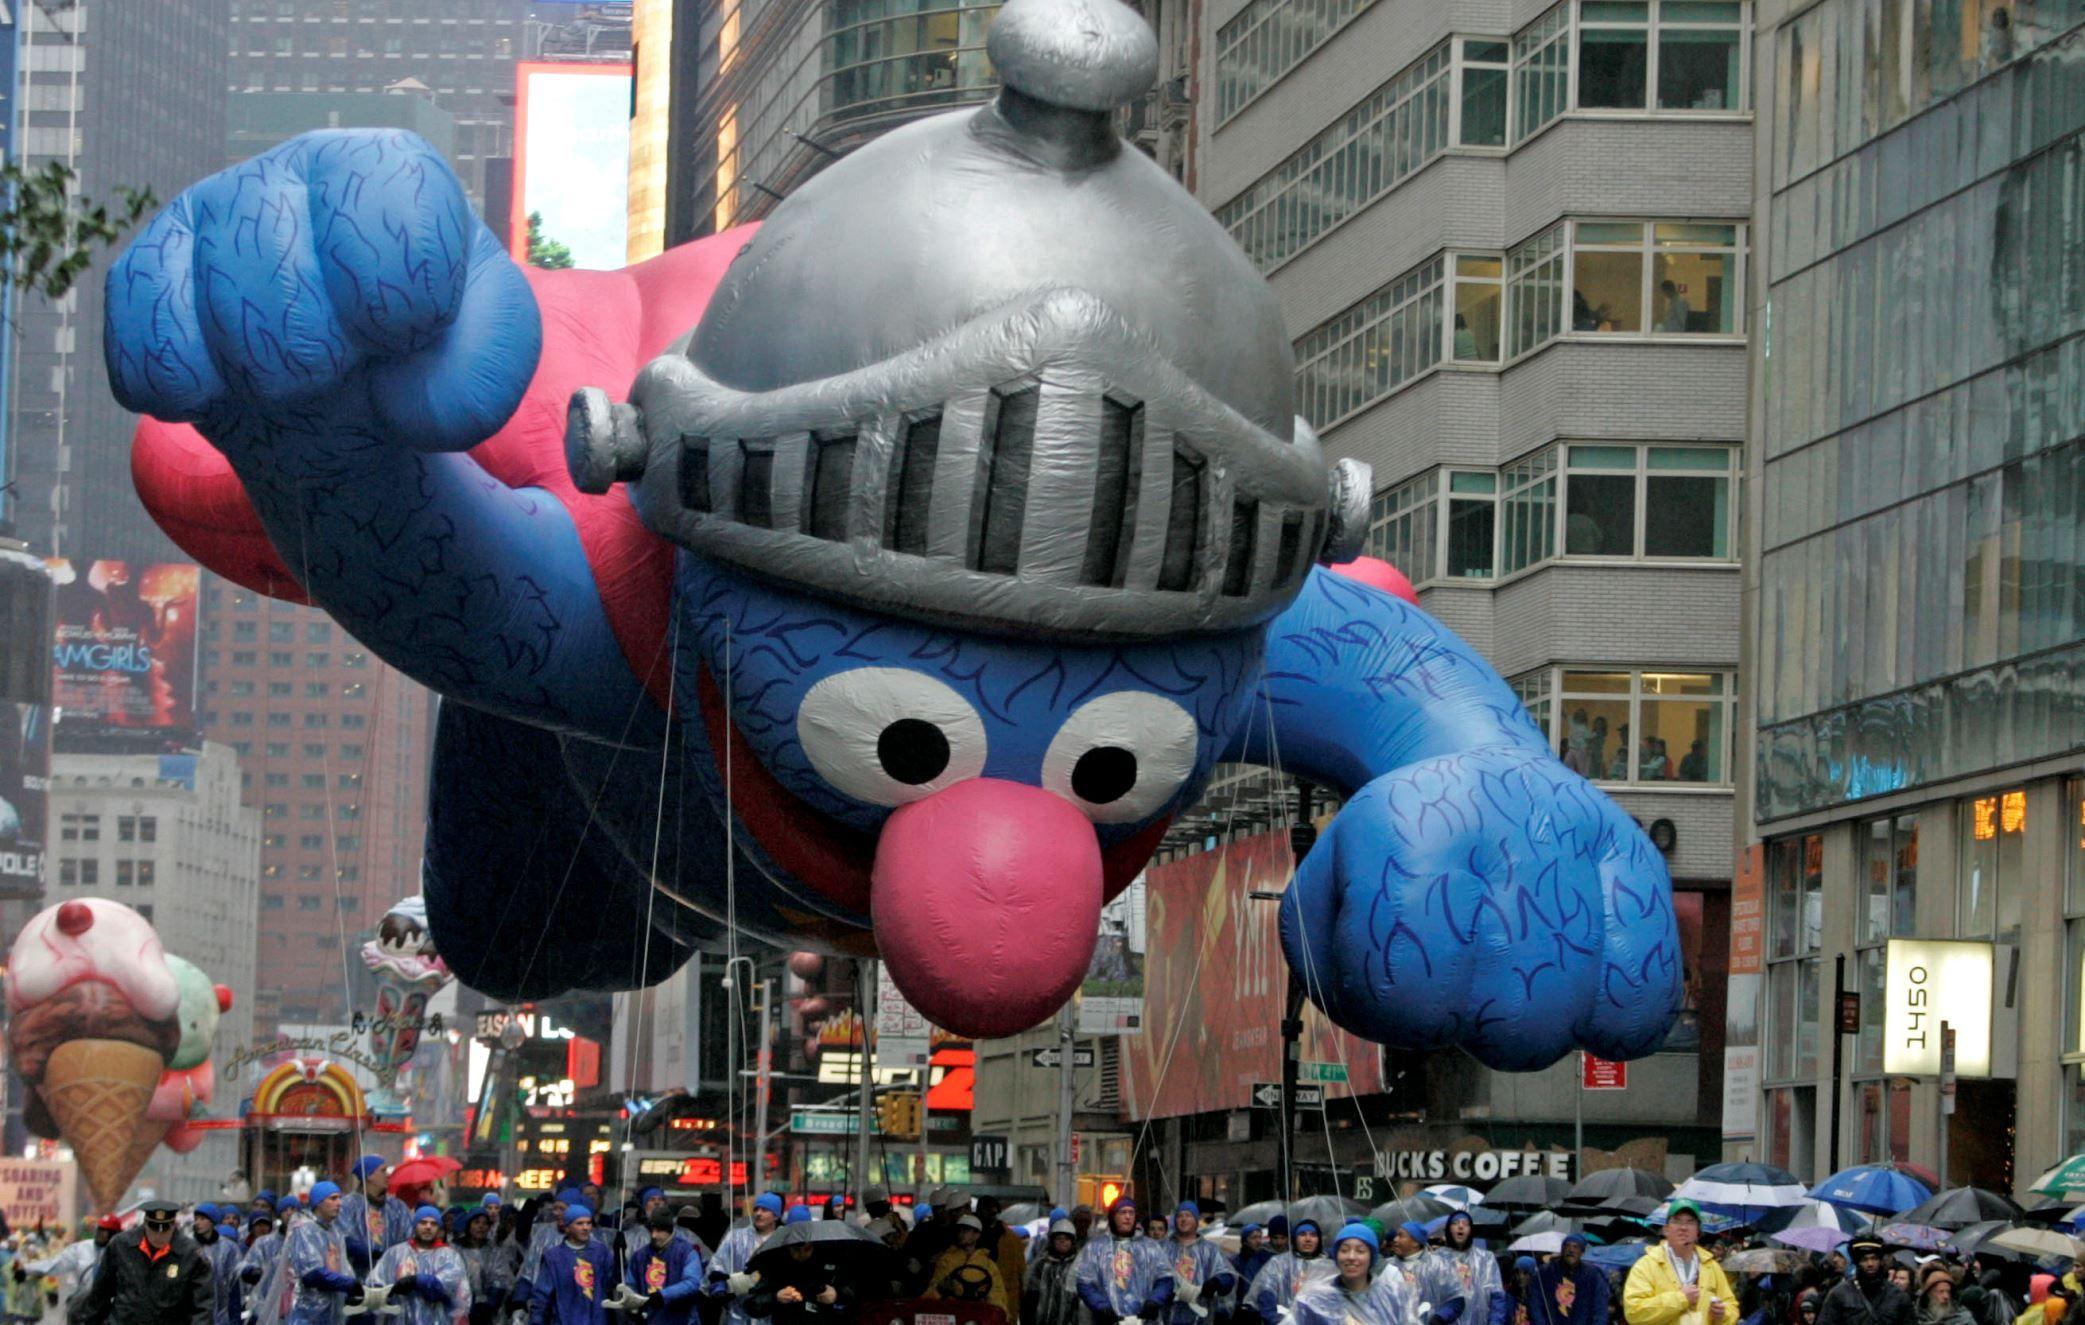 Outrageous Macy S Thanksgiving Day Parade Balloons Macy S Thanksgiving Day Parade Thanksgiving Day Parade Macys Parade